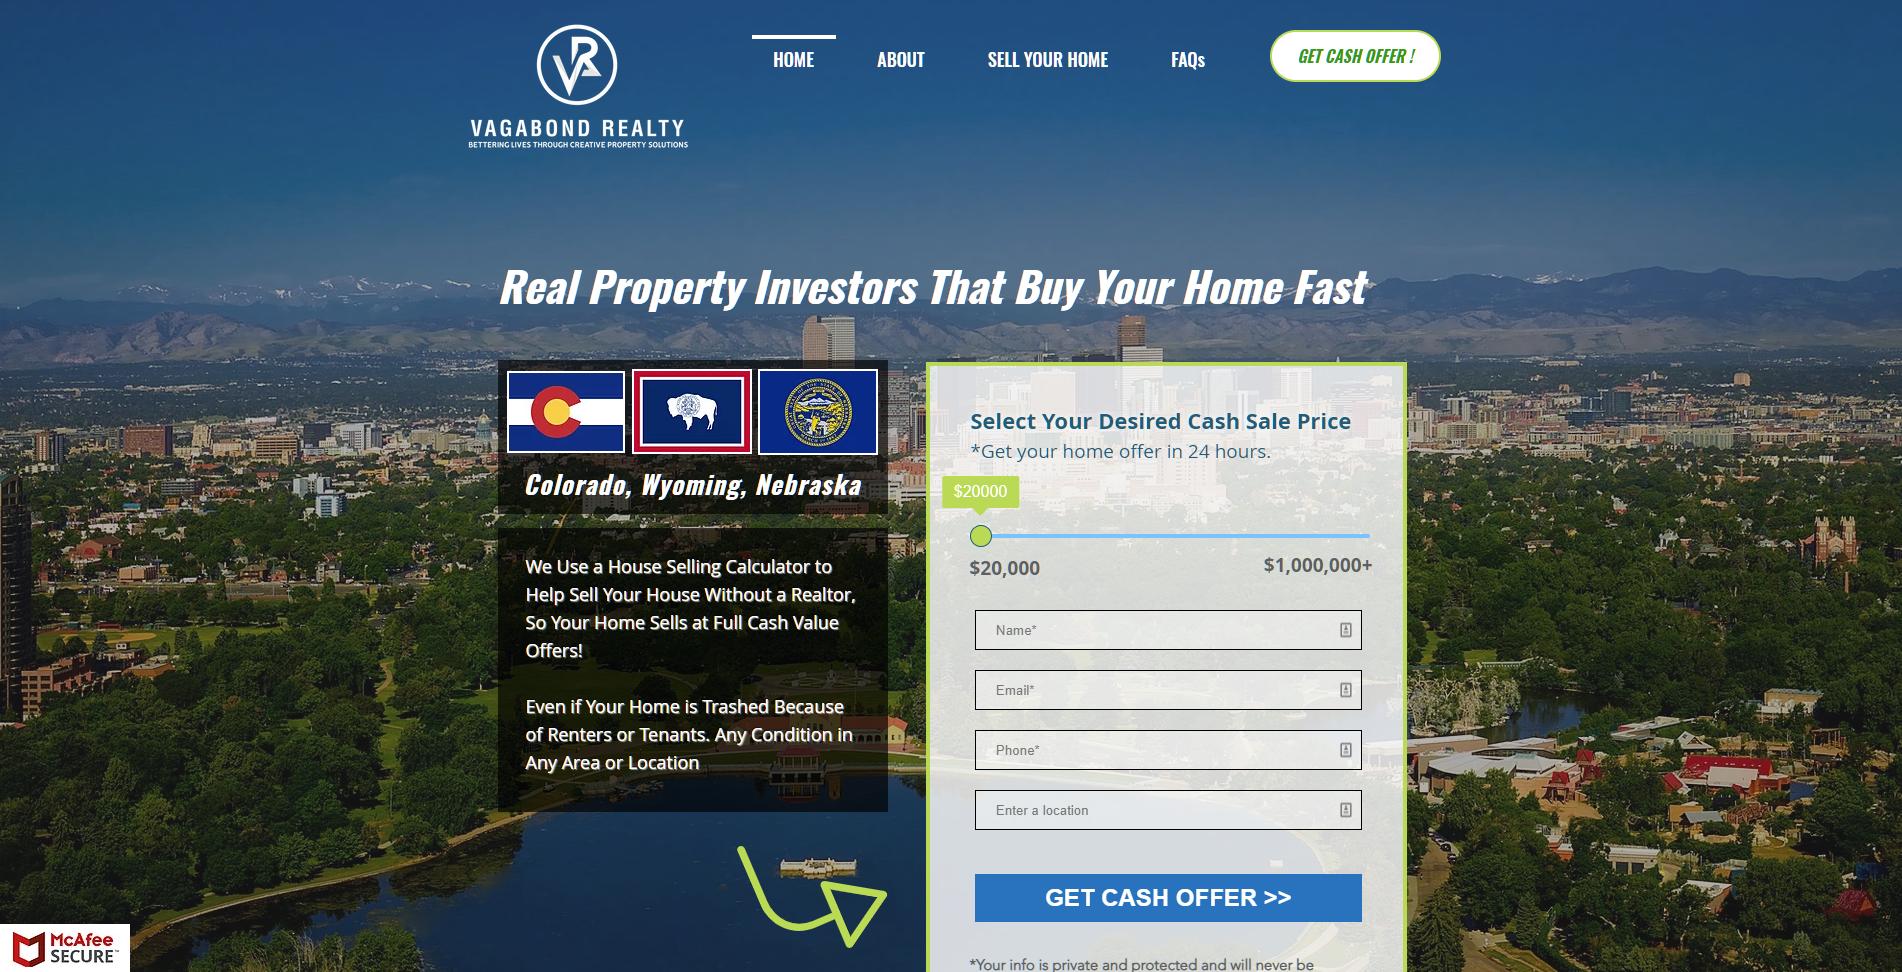 Vagabond Realty Wyoming - Daniel James Media Website Design